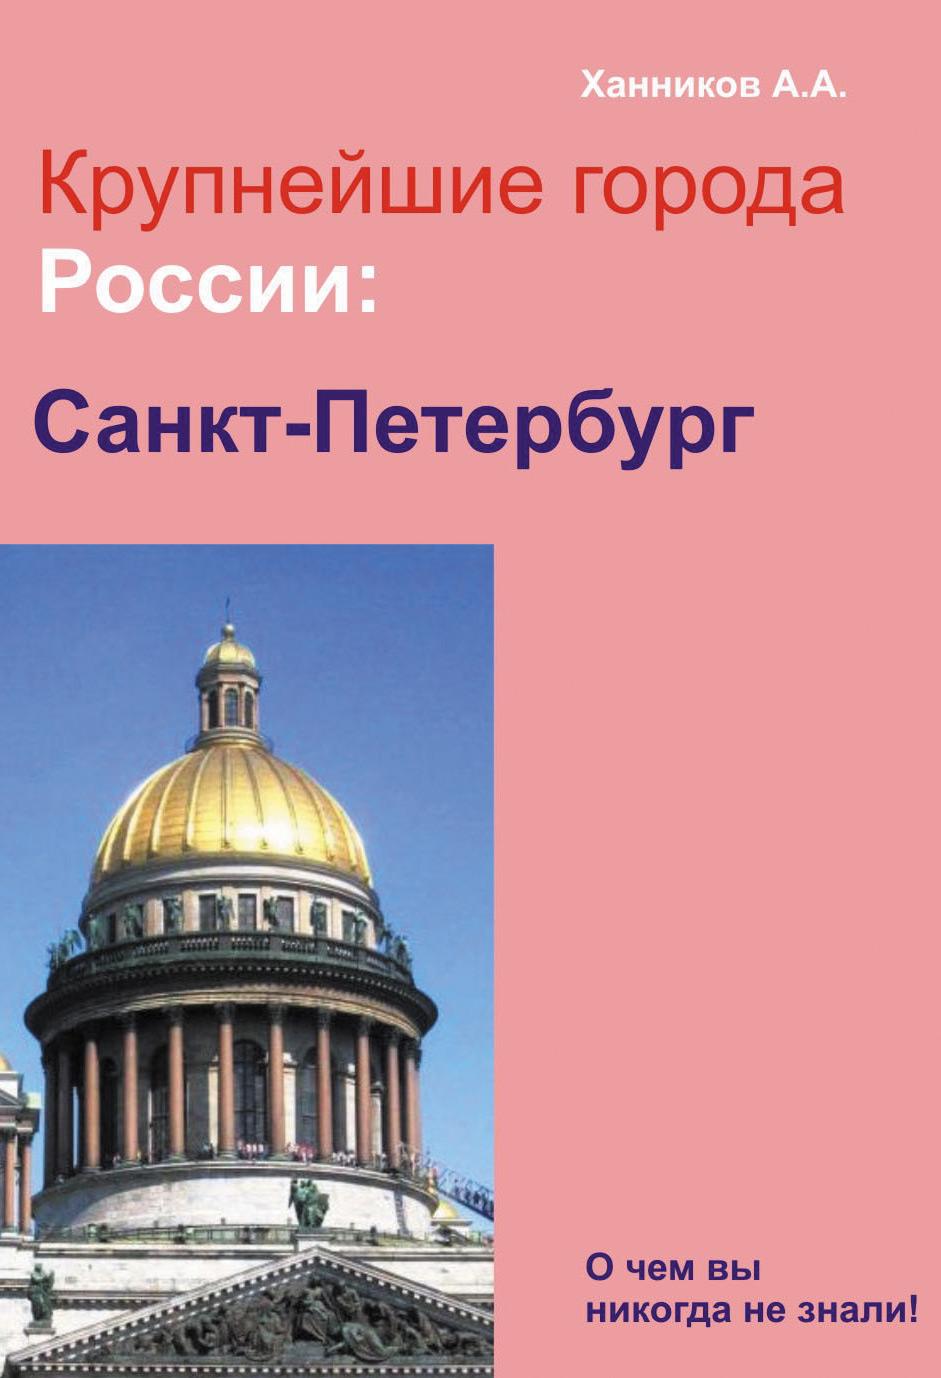 Фото - Александр Ханников Санкт-Петербург александр марголис санкт петербург подарочное издание